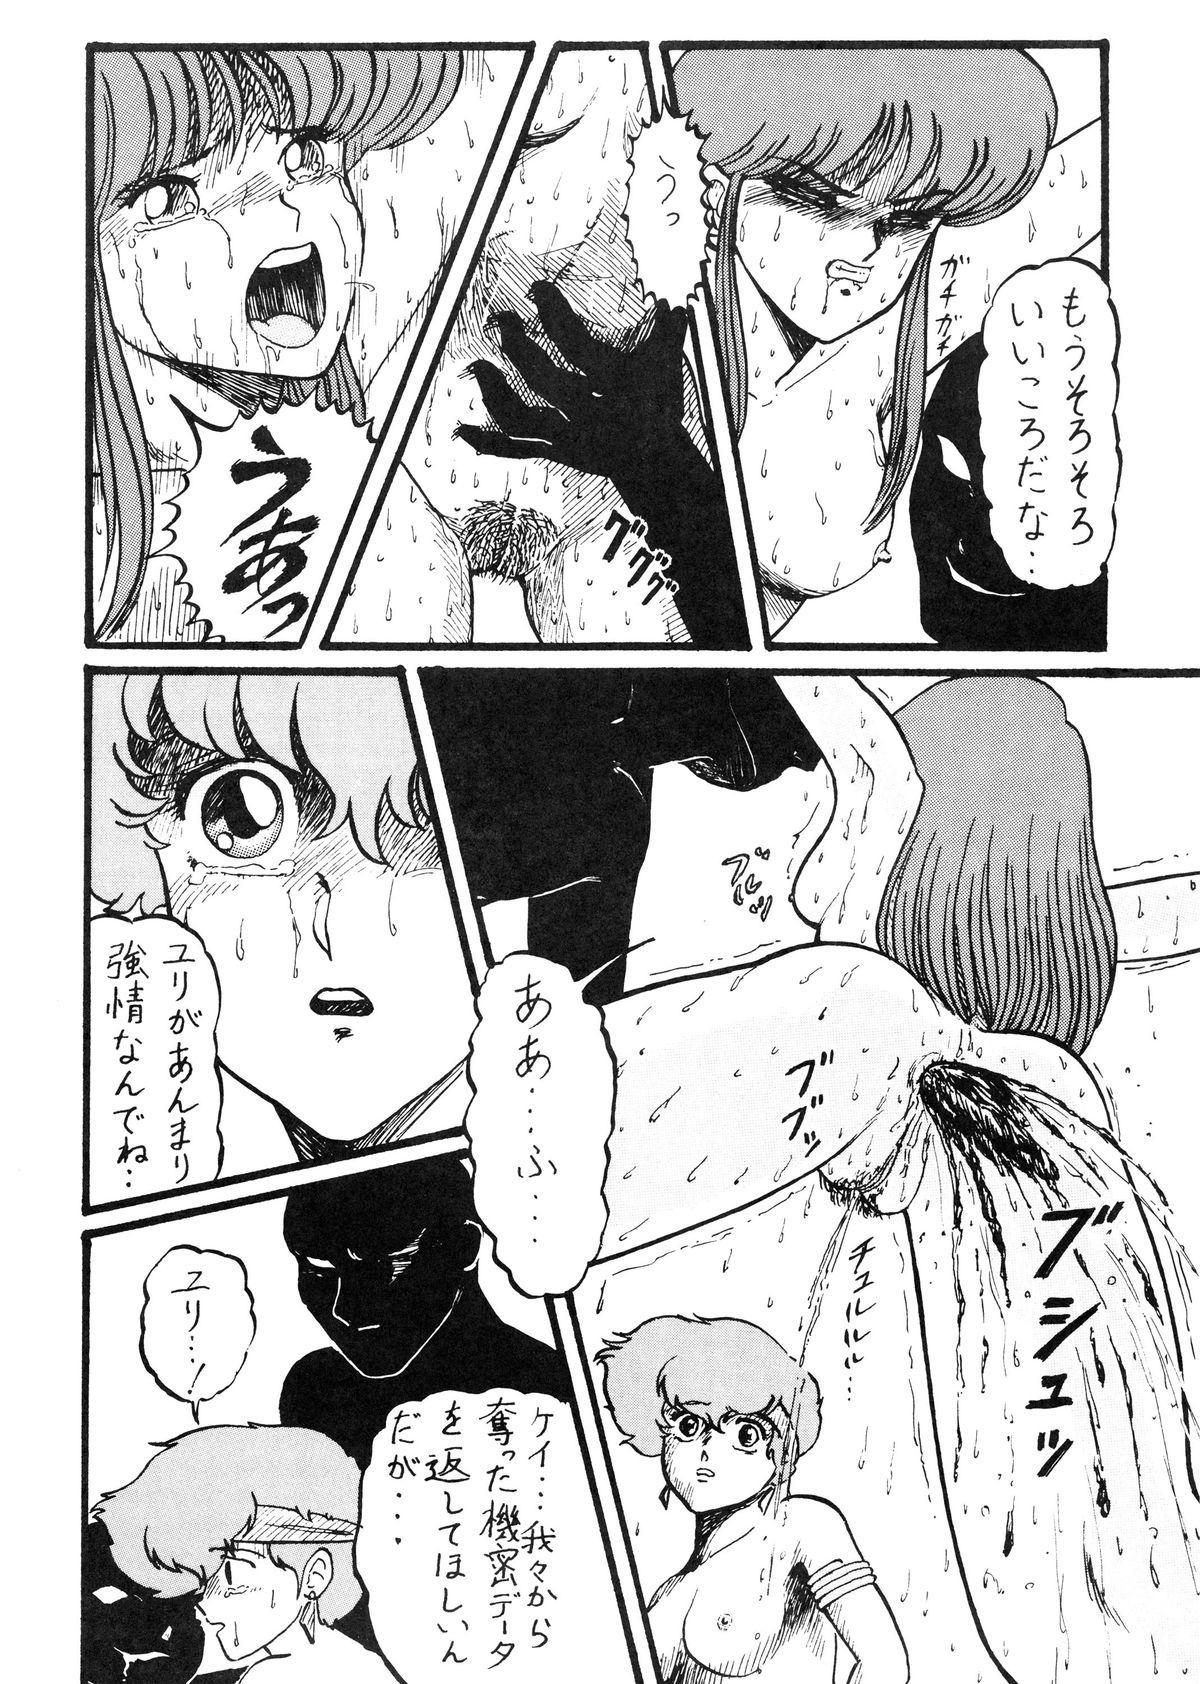 [Secret Society Chi (Iijima Mario)] Kai II - Iijima Mario Kojin-shi - (Various) 34